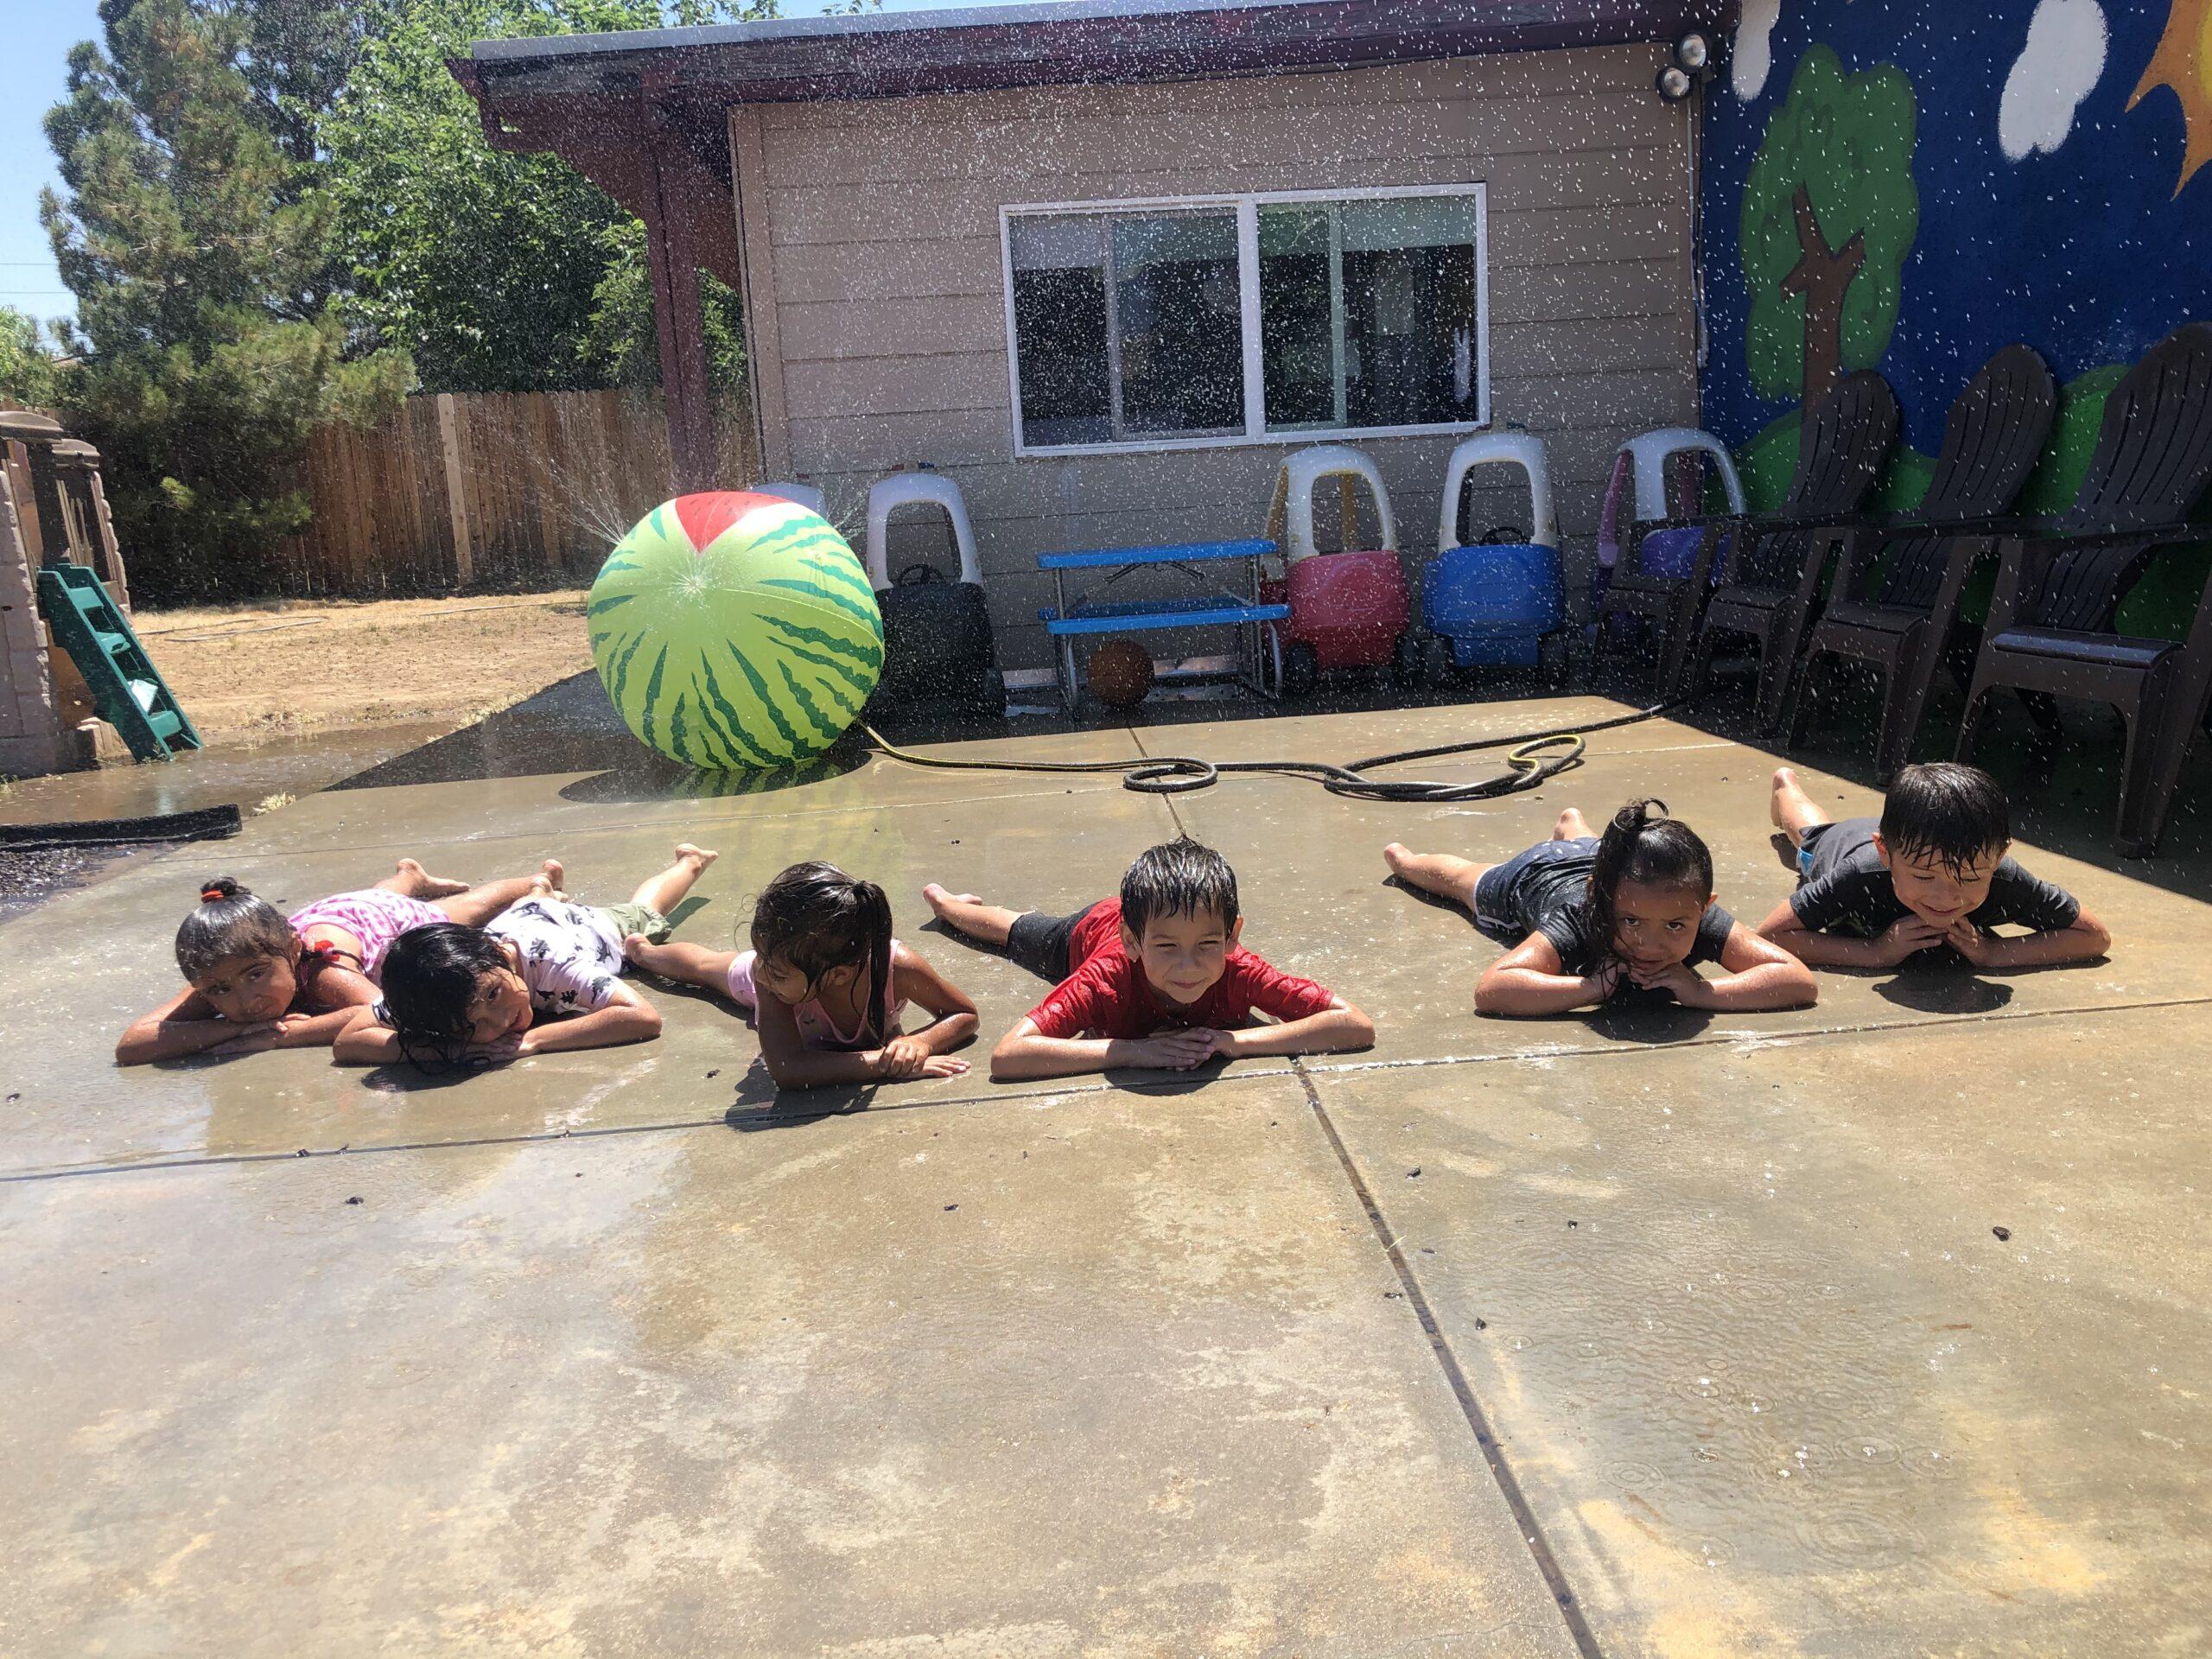 daycare kids Get Wet